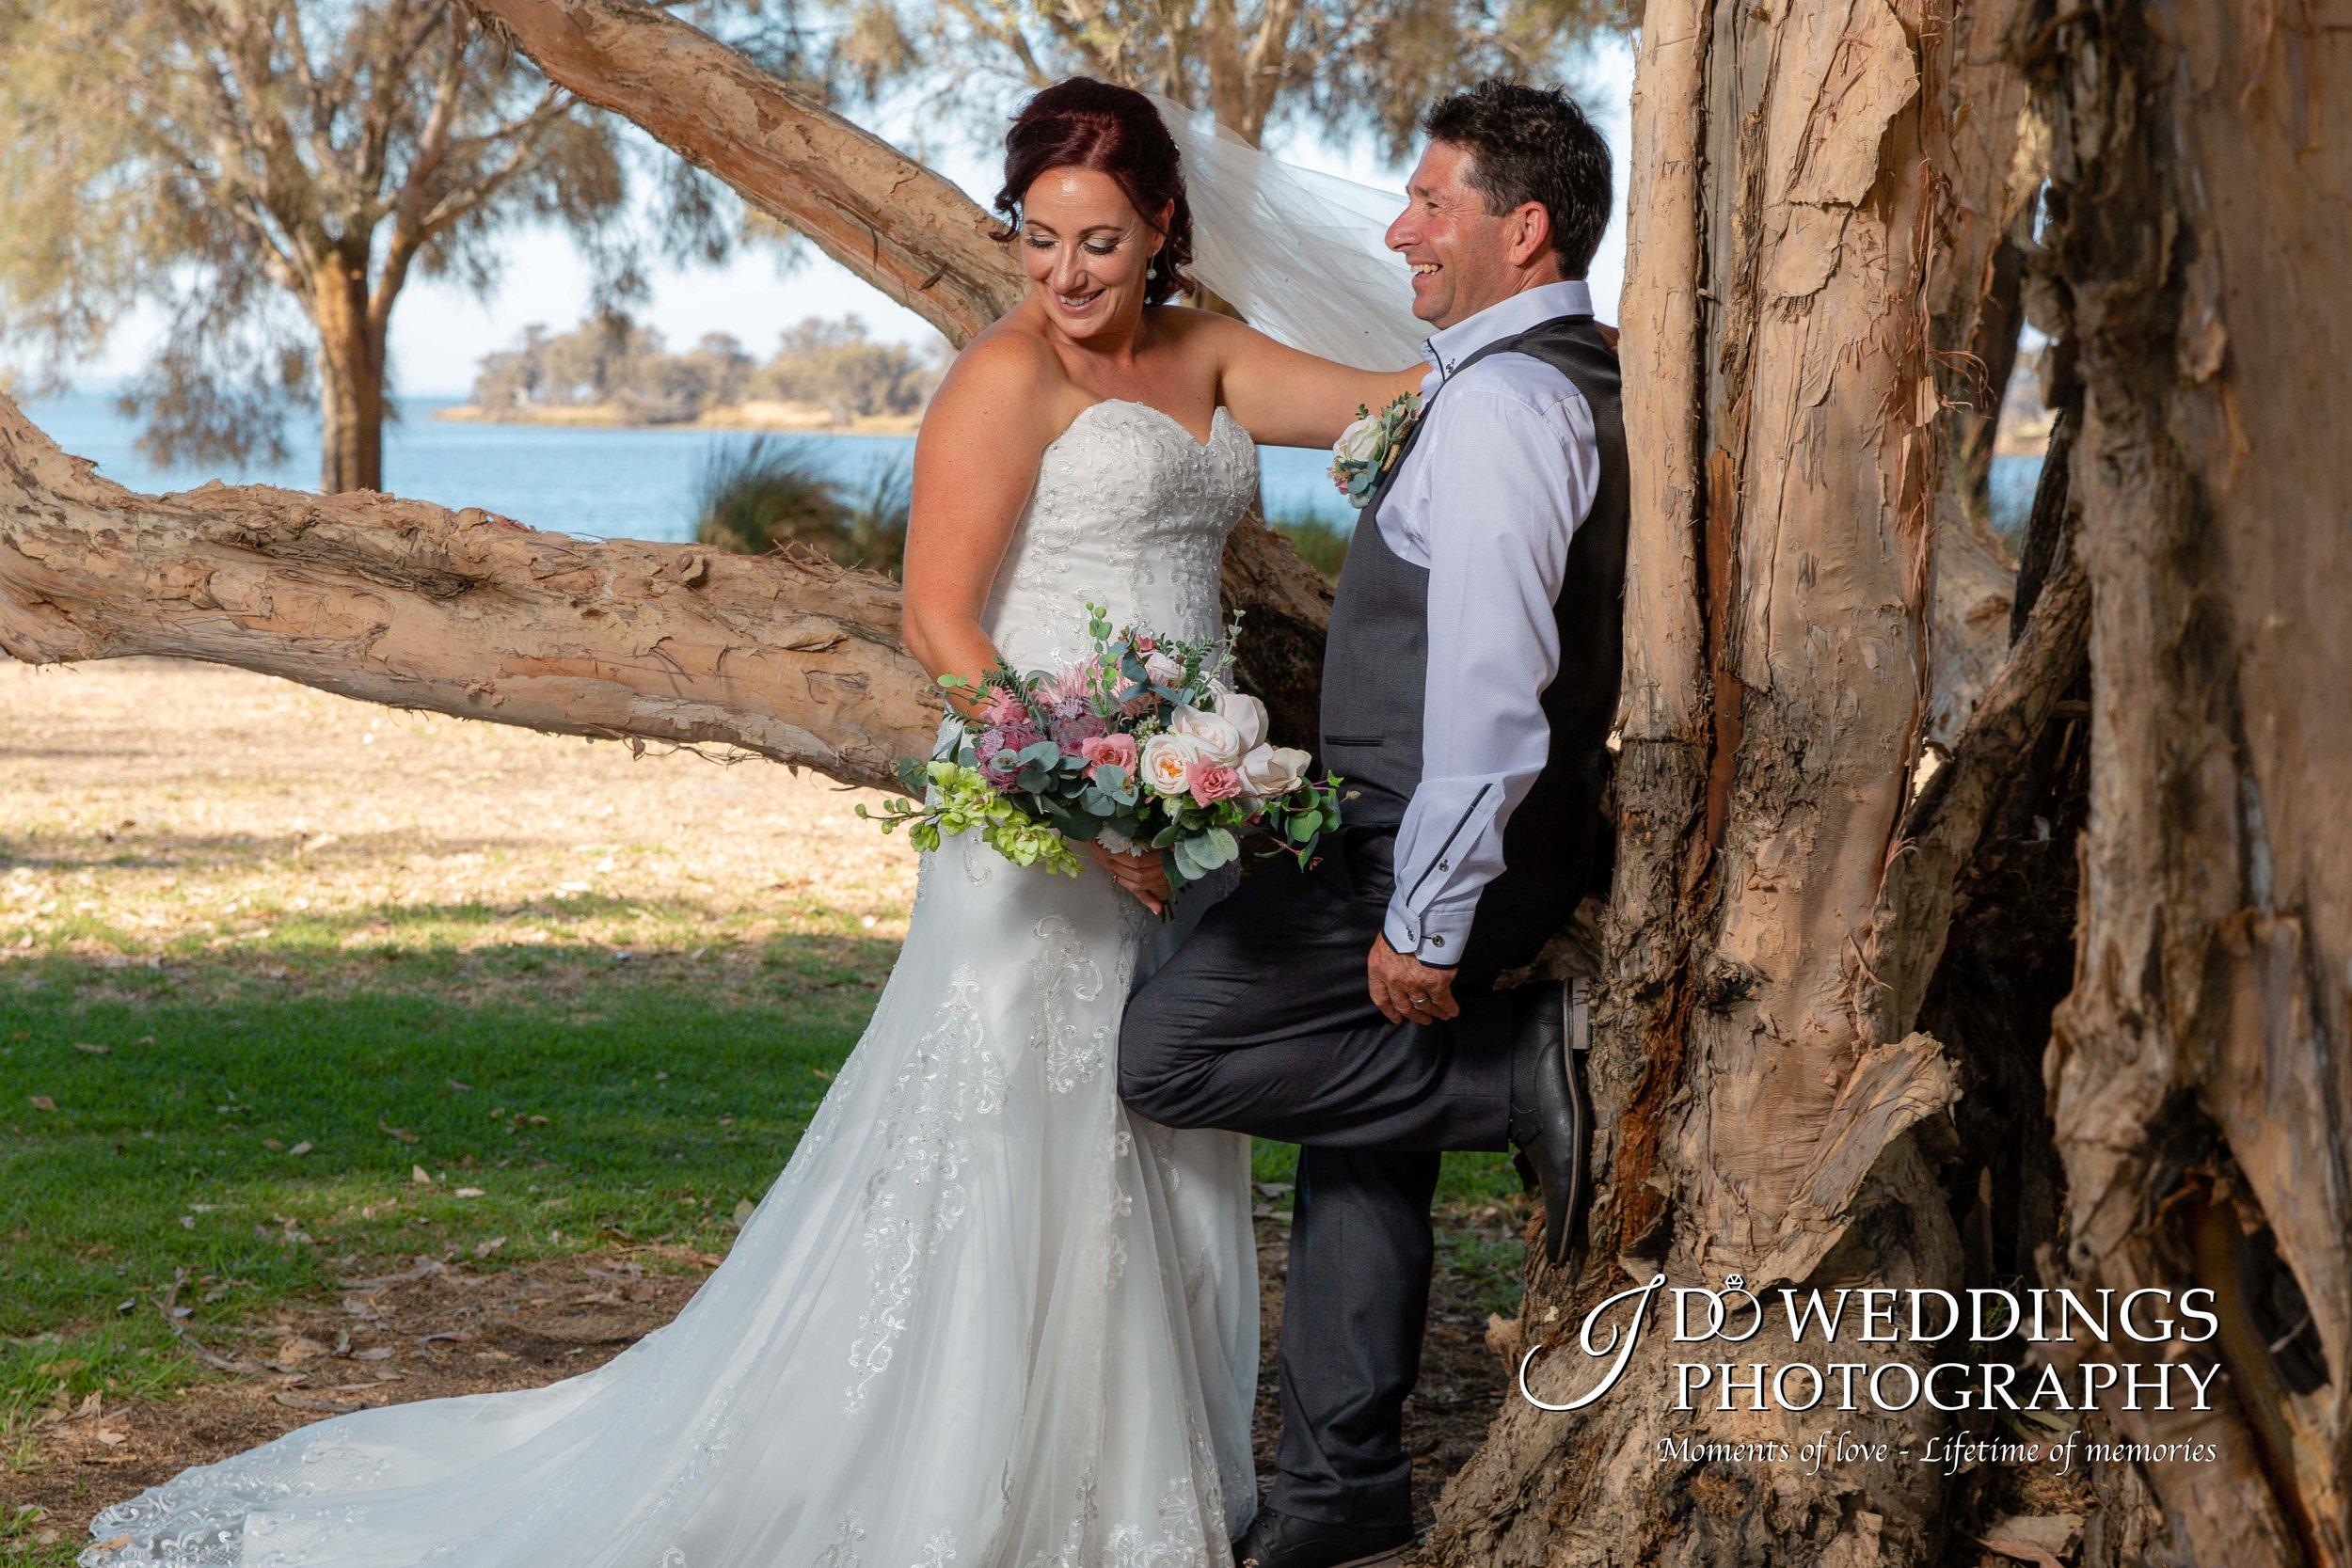 wedding images12.jpg